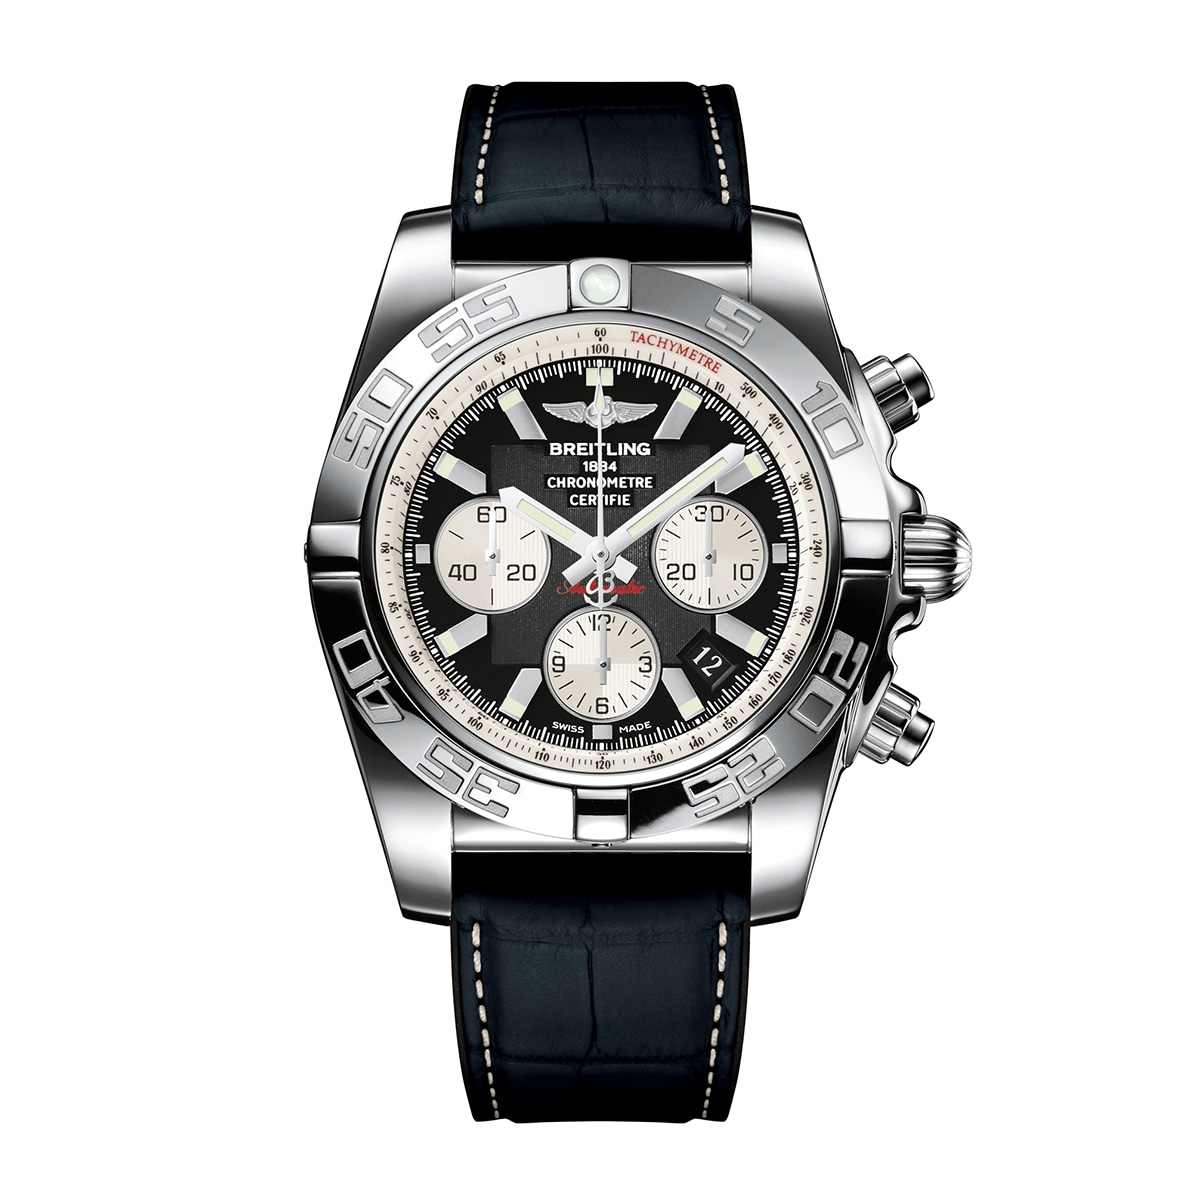 Breitling_Chronomat-44-Steel-polished-Onyx-Black-AB011012-B967-296S-A20D.4_hos_Jarl_Sandin